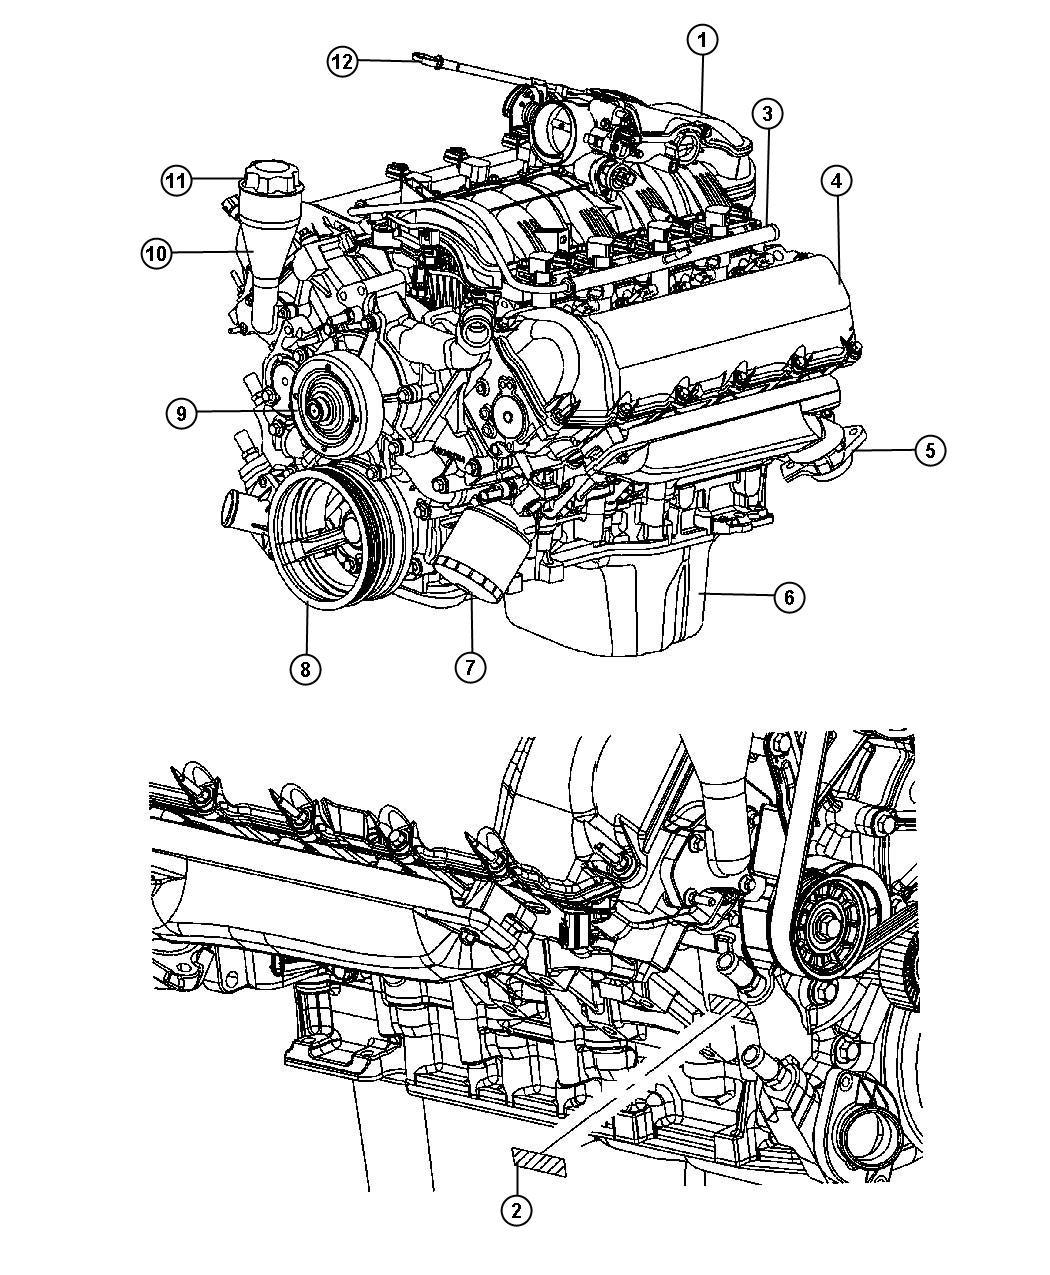 Chevy 5 7l Engine Diagram